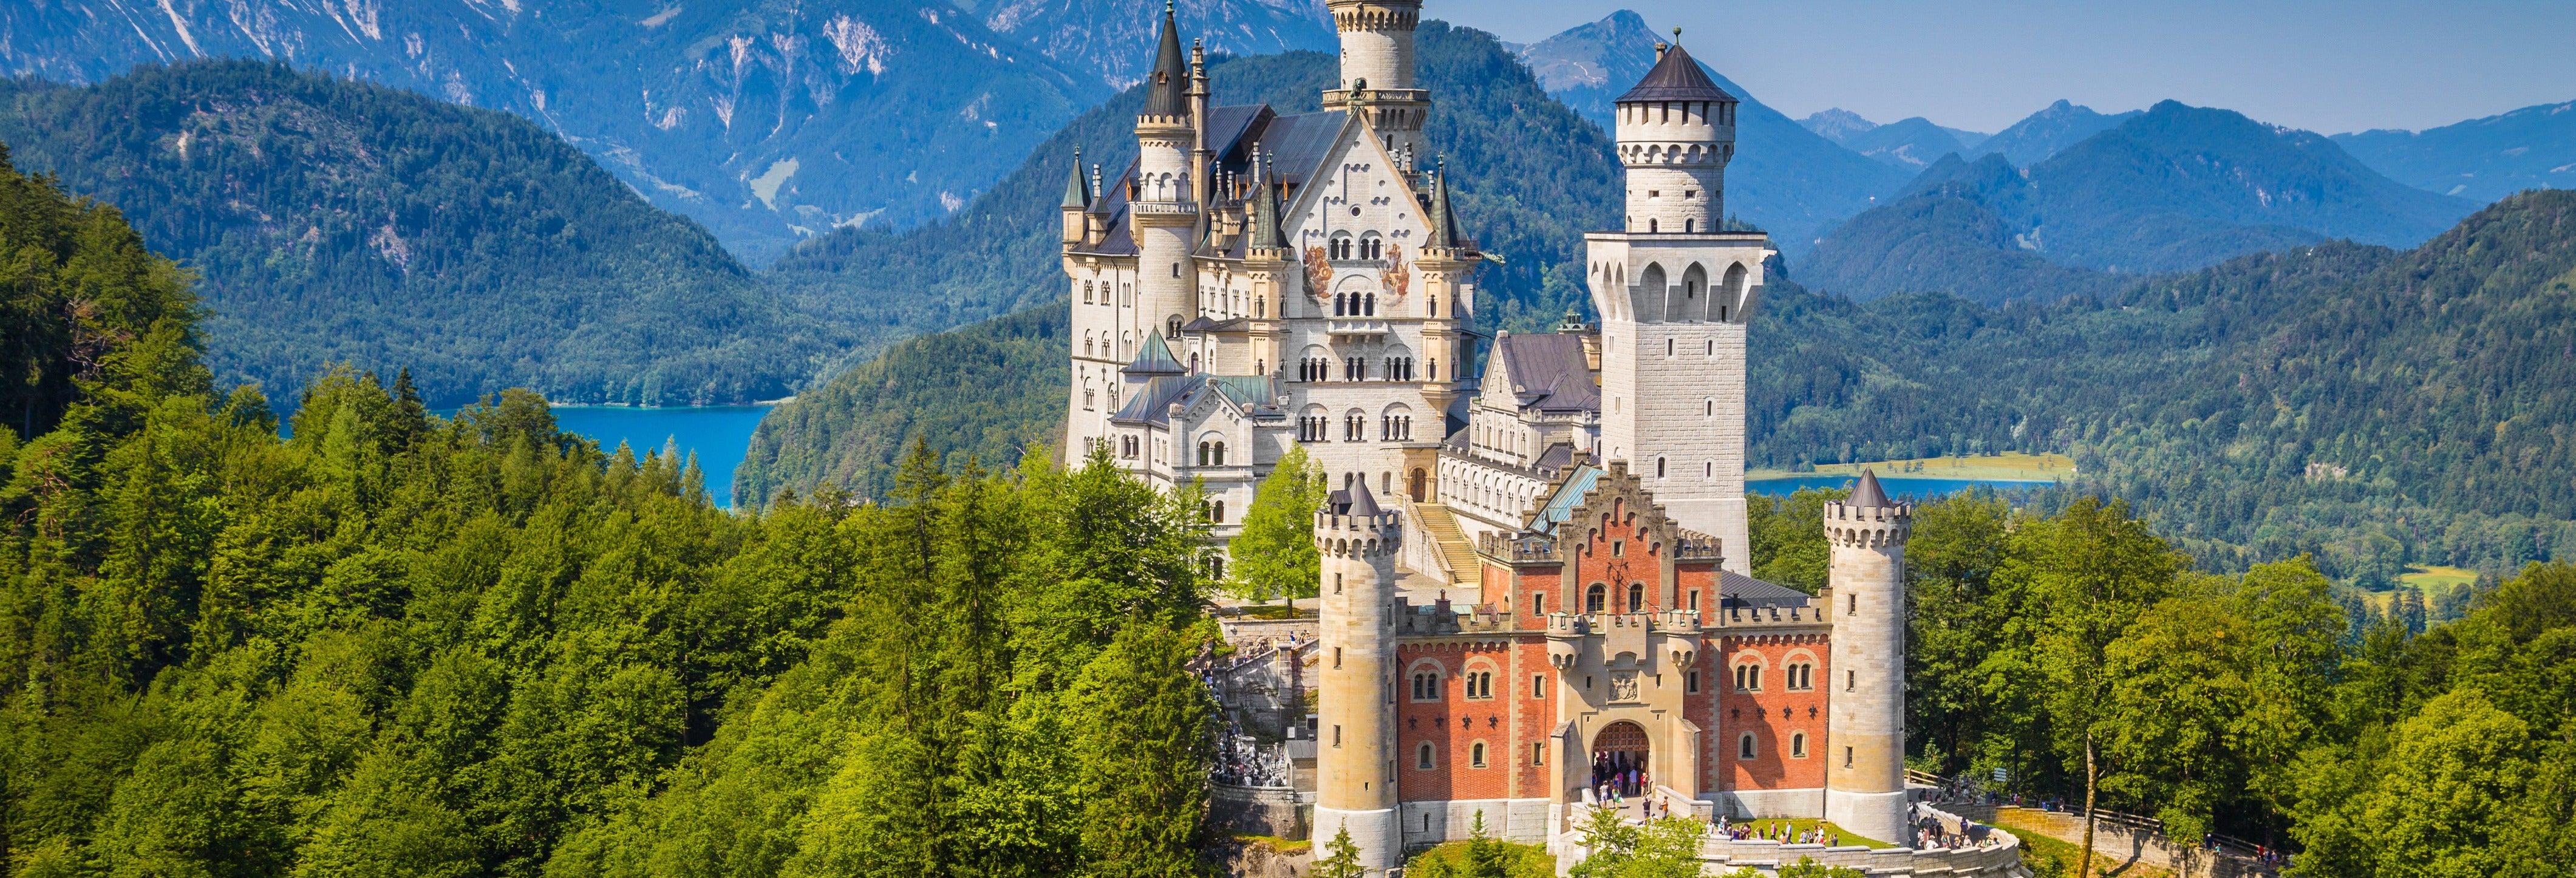 Excursión al castillo de Neuschwanstein